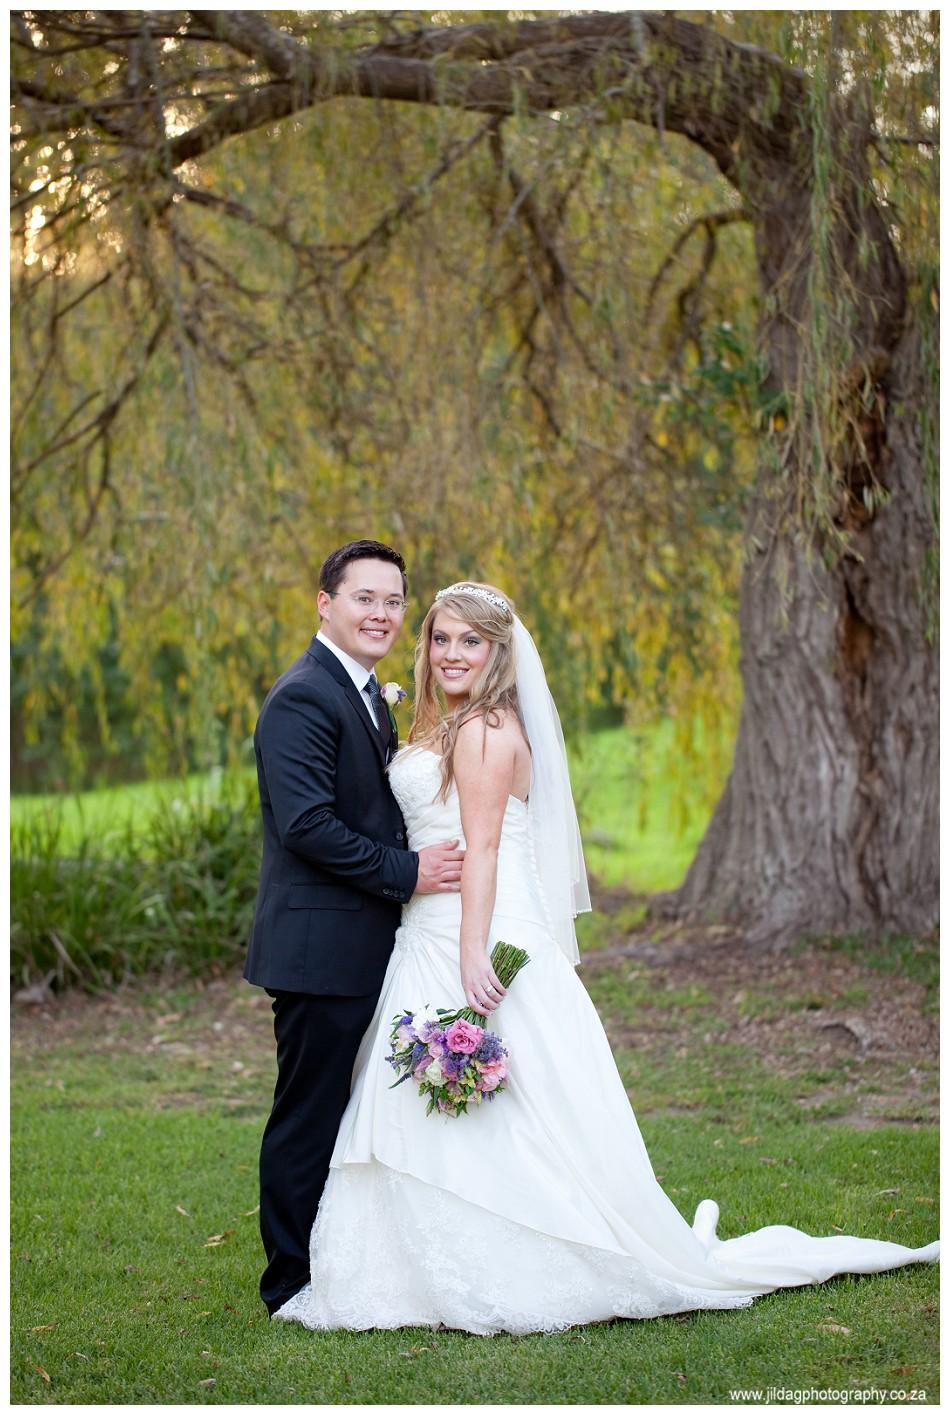 Blaauklippen - Stellenbosch wedding - Jilda G Photography (83)